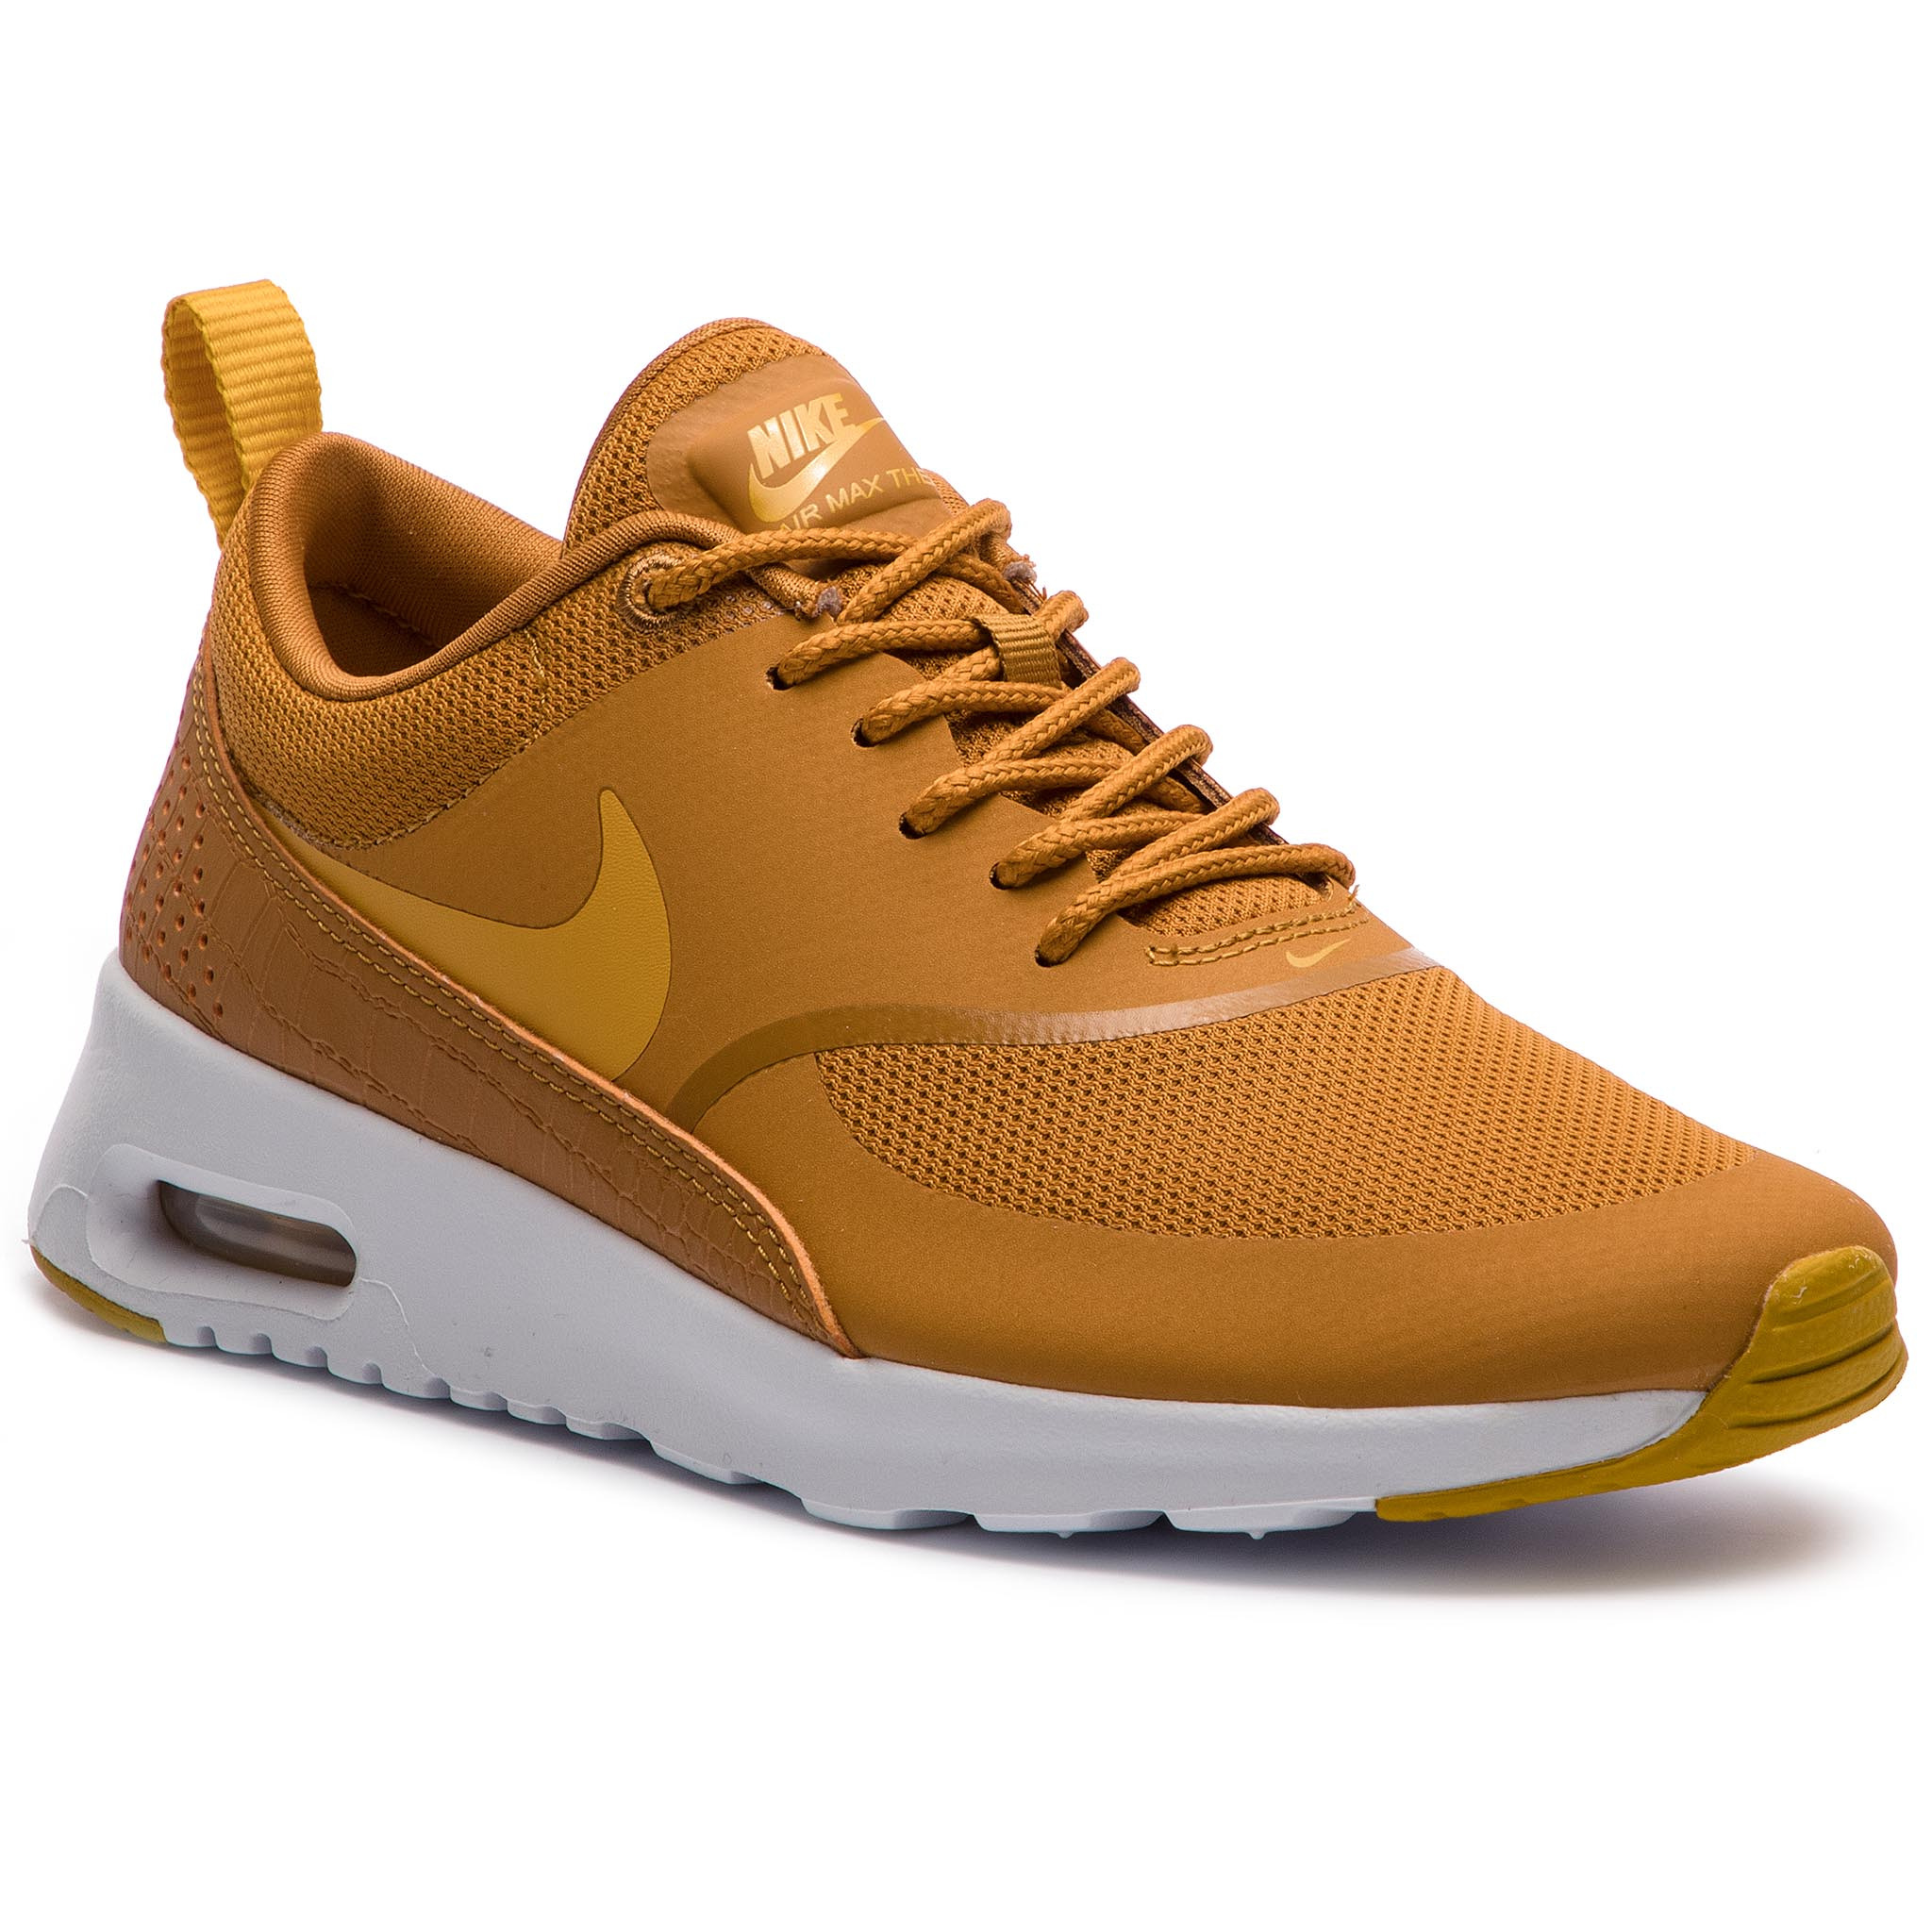 release date ec39d 587db Shoes NIKE Air Max Thea 599409 701 Desert Ochre Gold Dart White